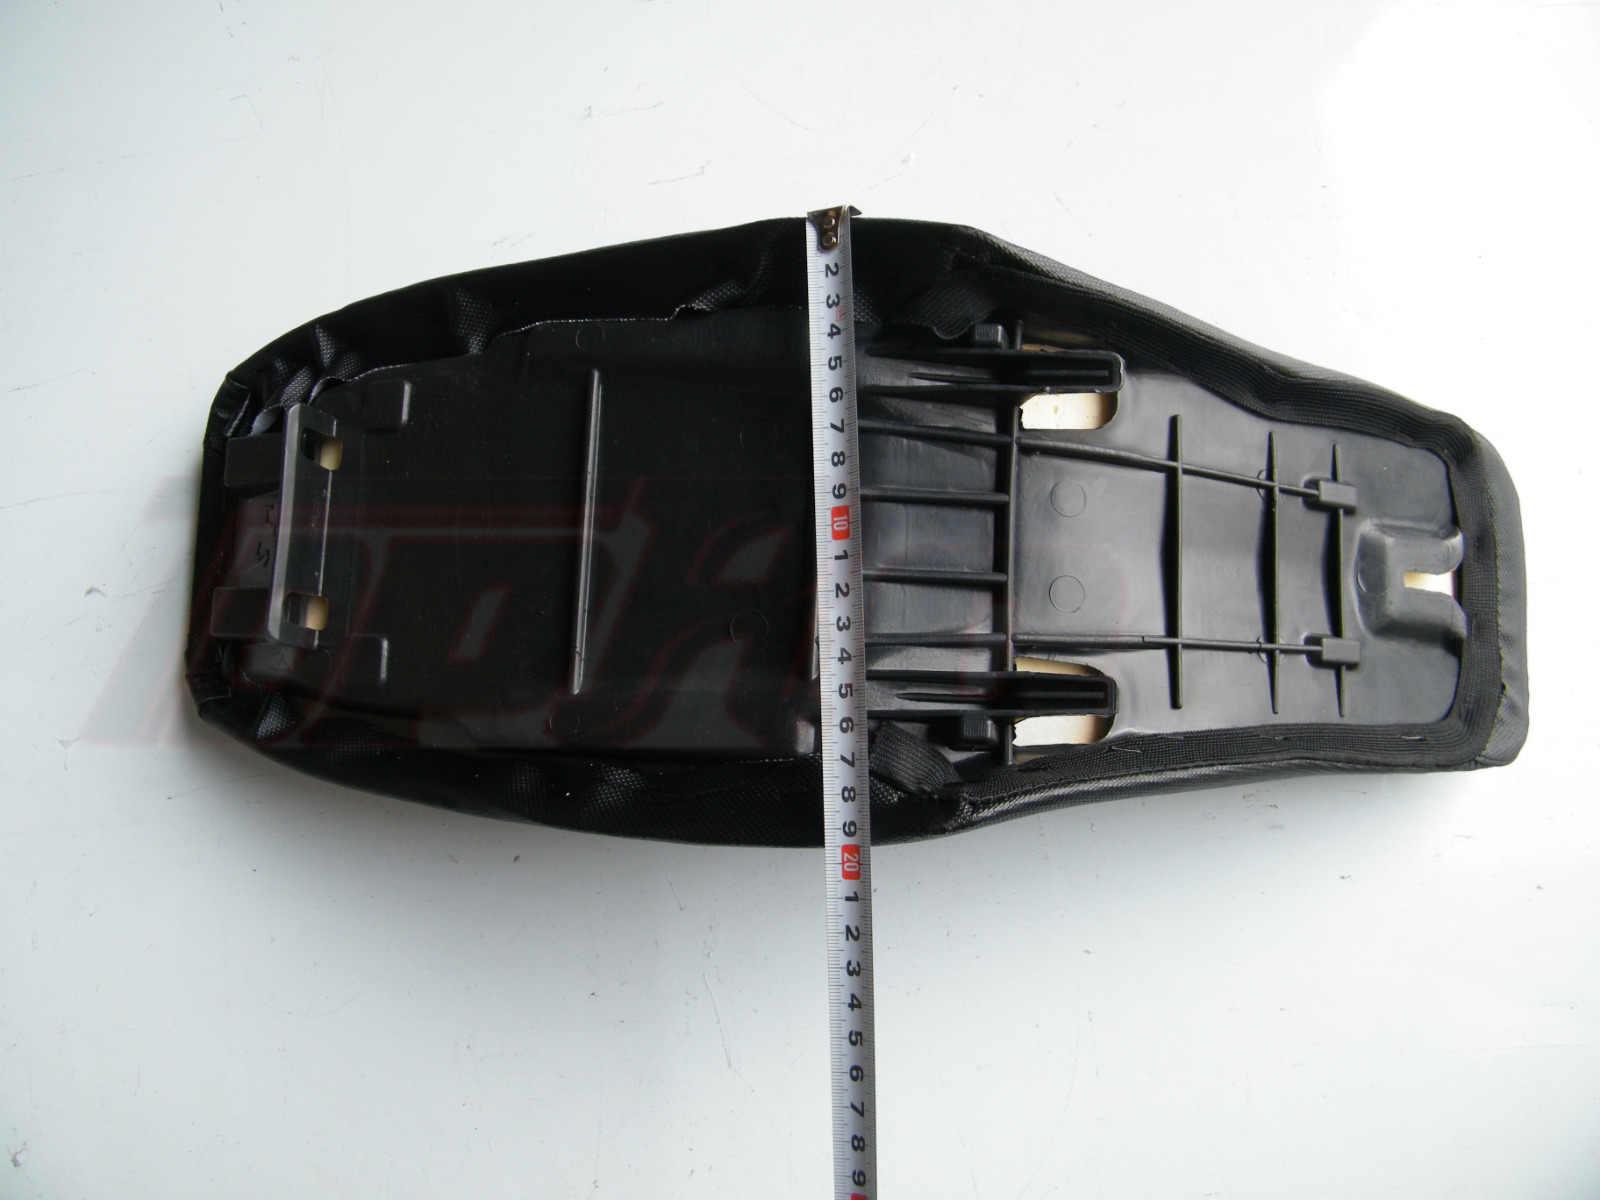 Hitam Motor Tinggi Bantal Kursi Nyaman Anti Selip Cafe RACER untuk Honda CRF70 CRF70F SSR 125cc 140cc 150cc Lubang Kotoran Sepeda